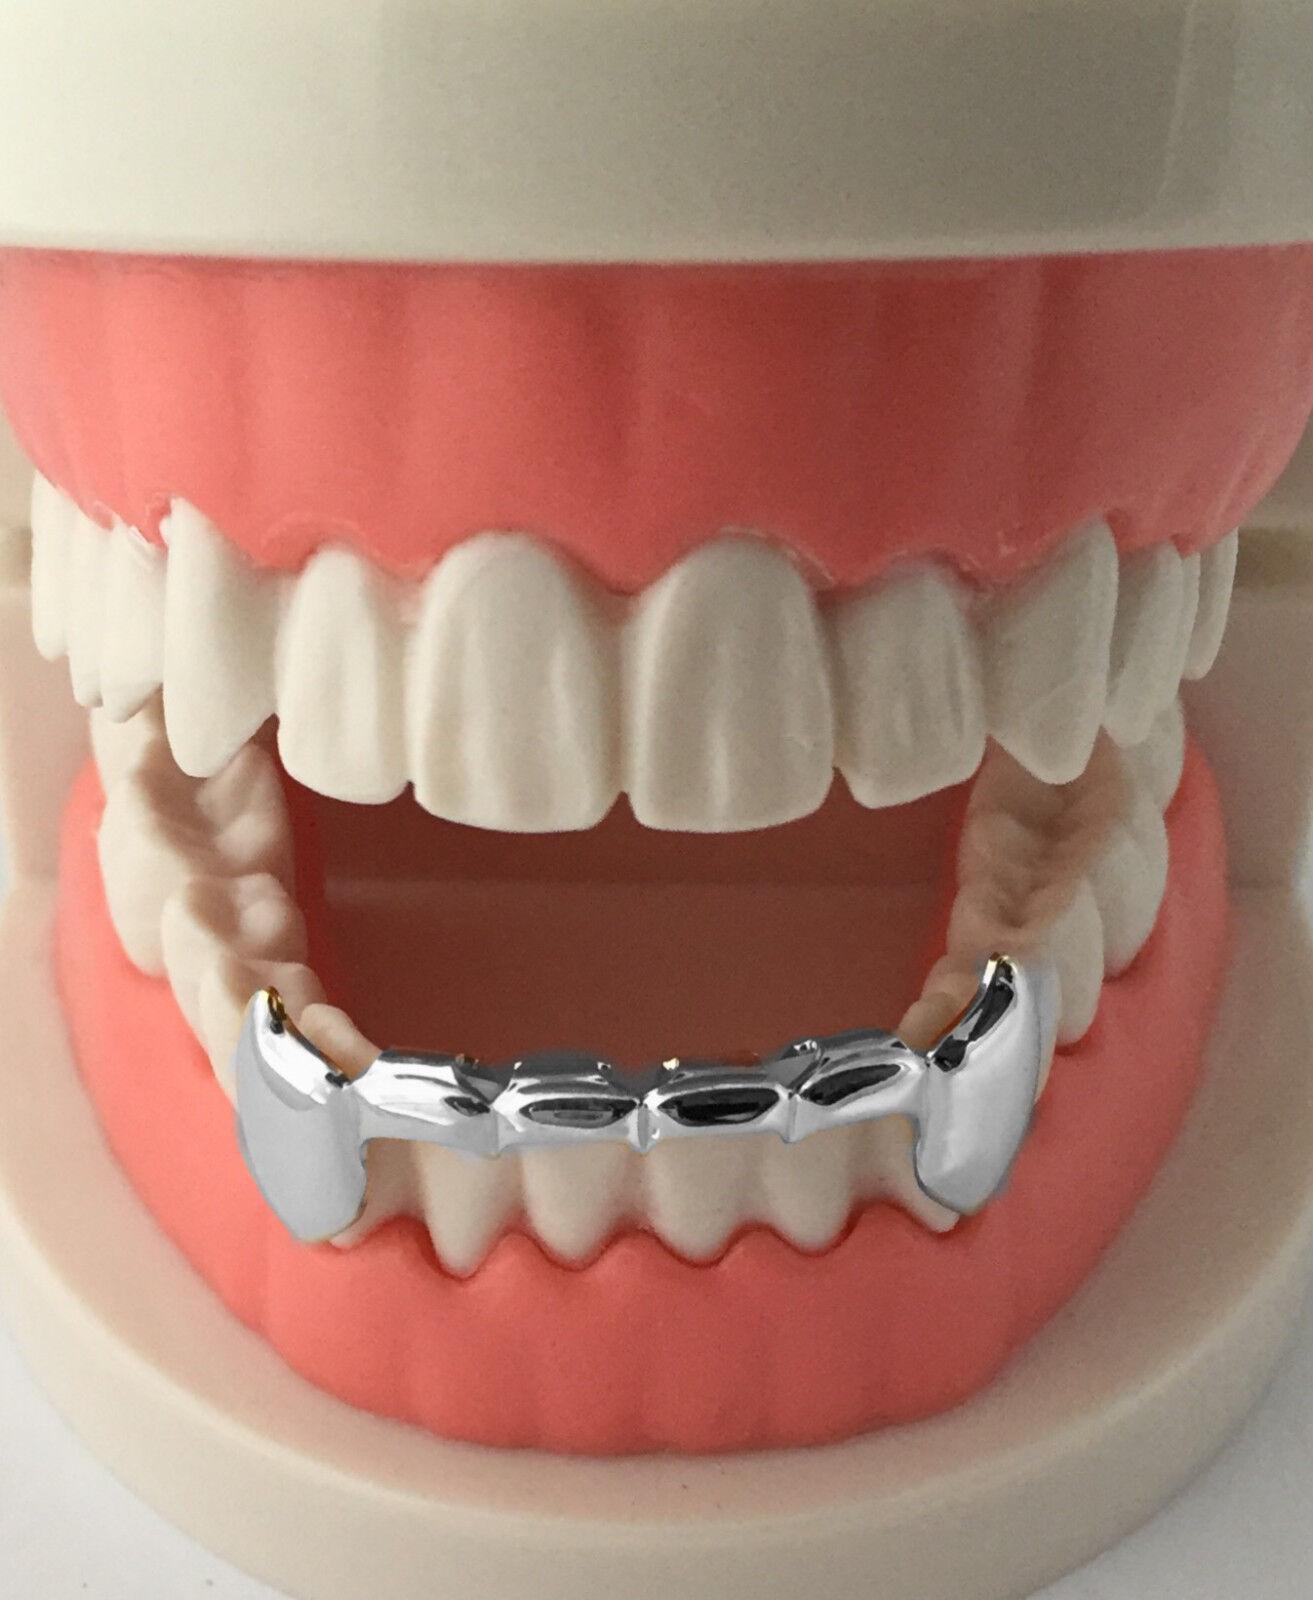 e78463e97f59c Hip Hop Silver Mouth Teeth Grills Grillz - Bottom Lower Fangs S020-HS фото